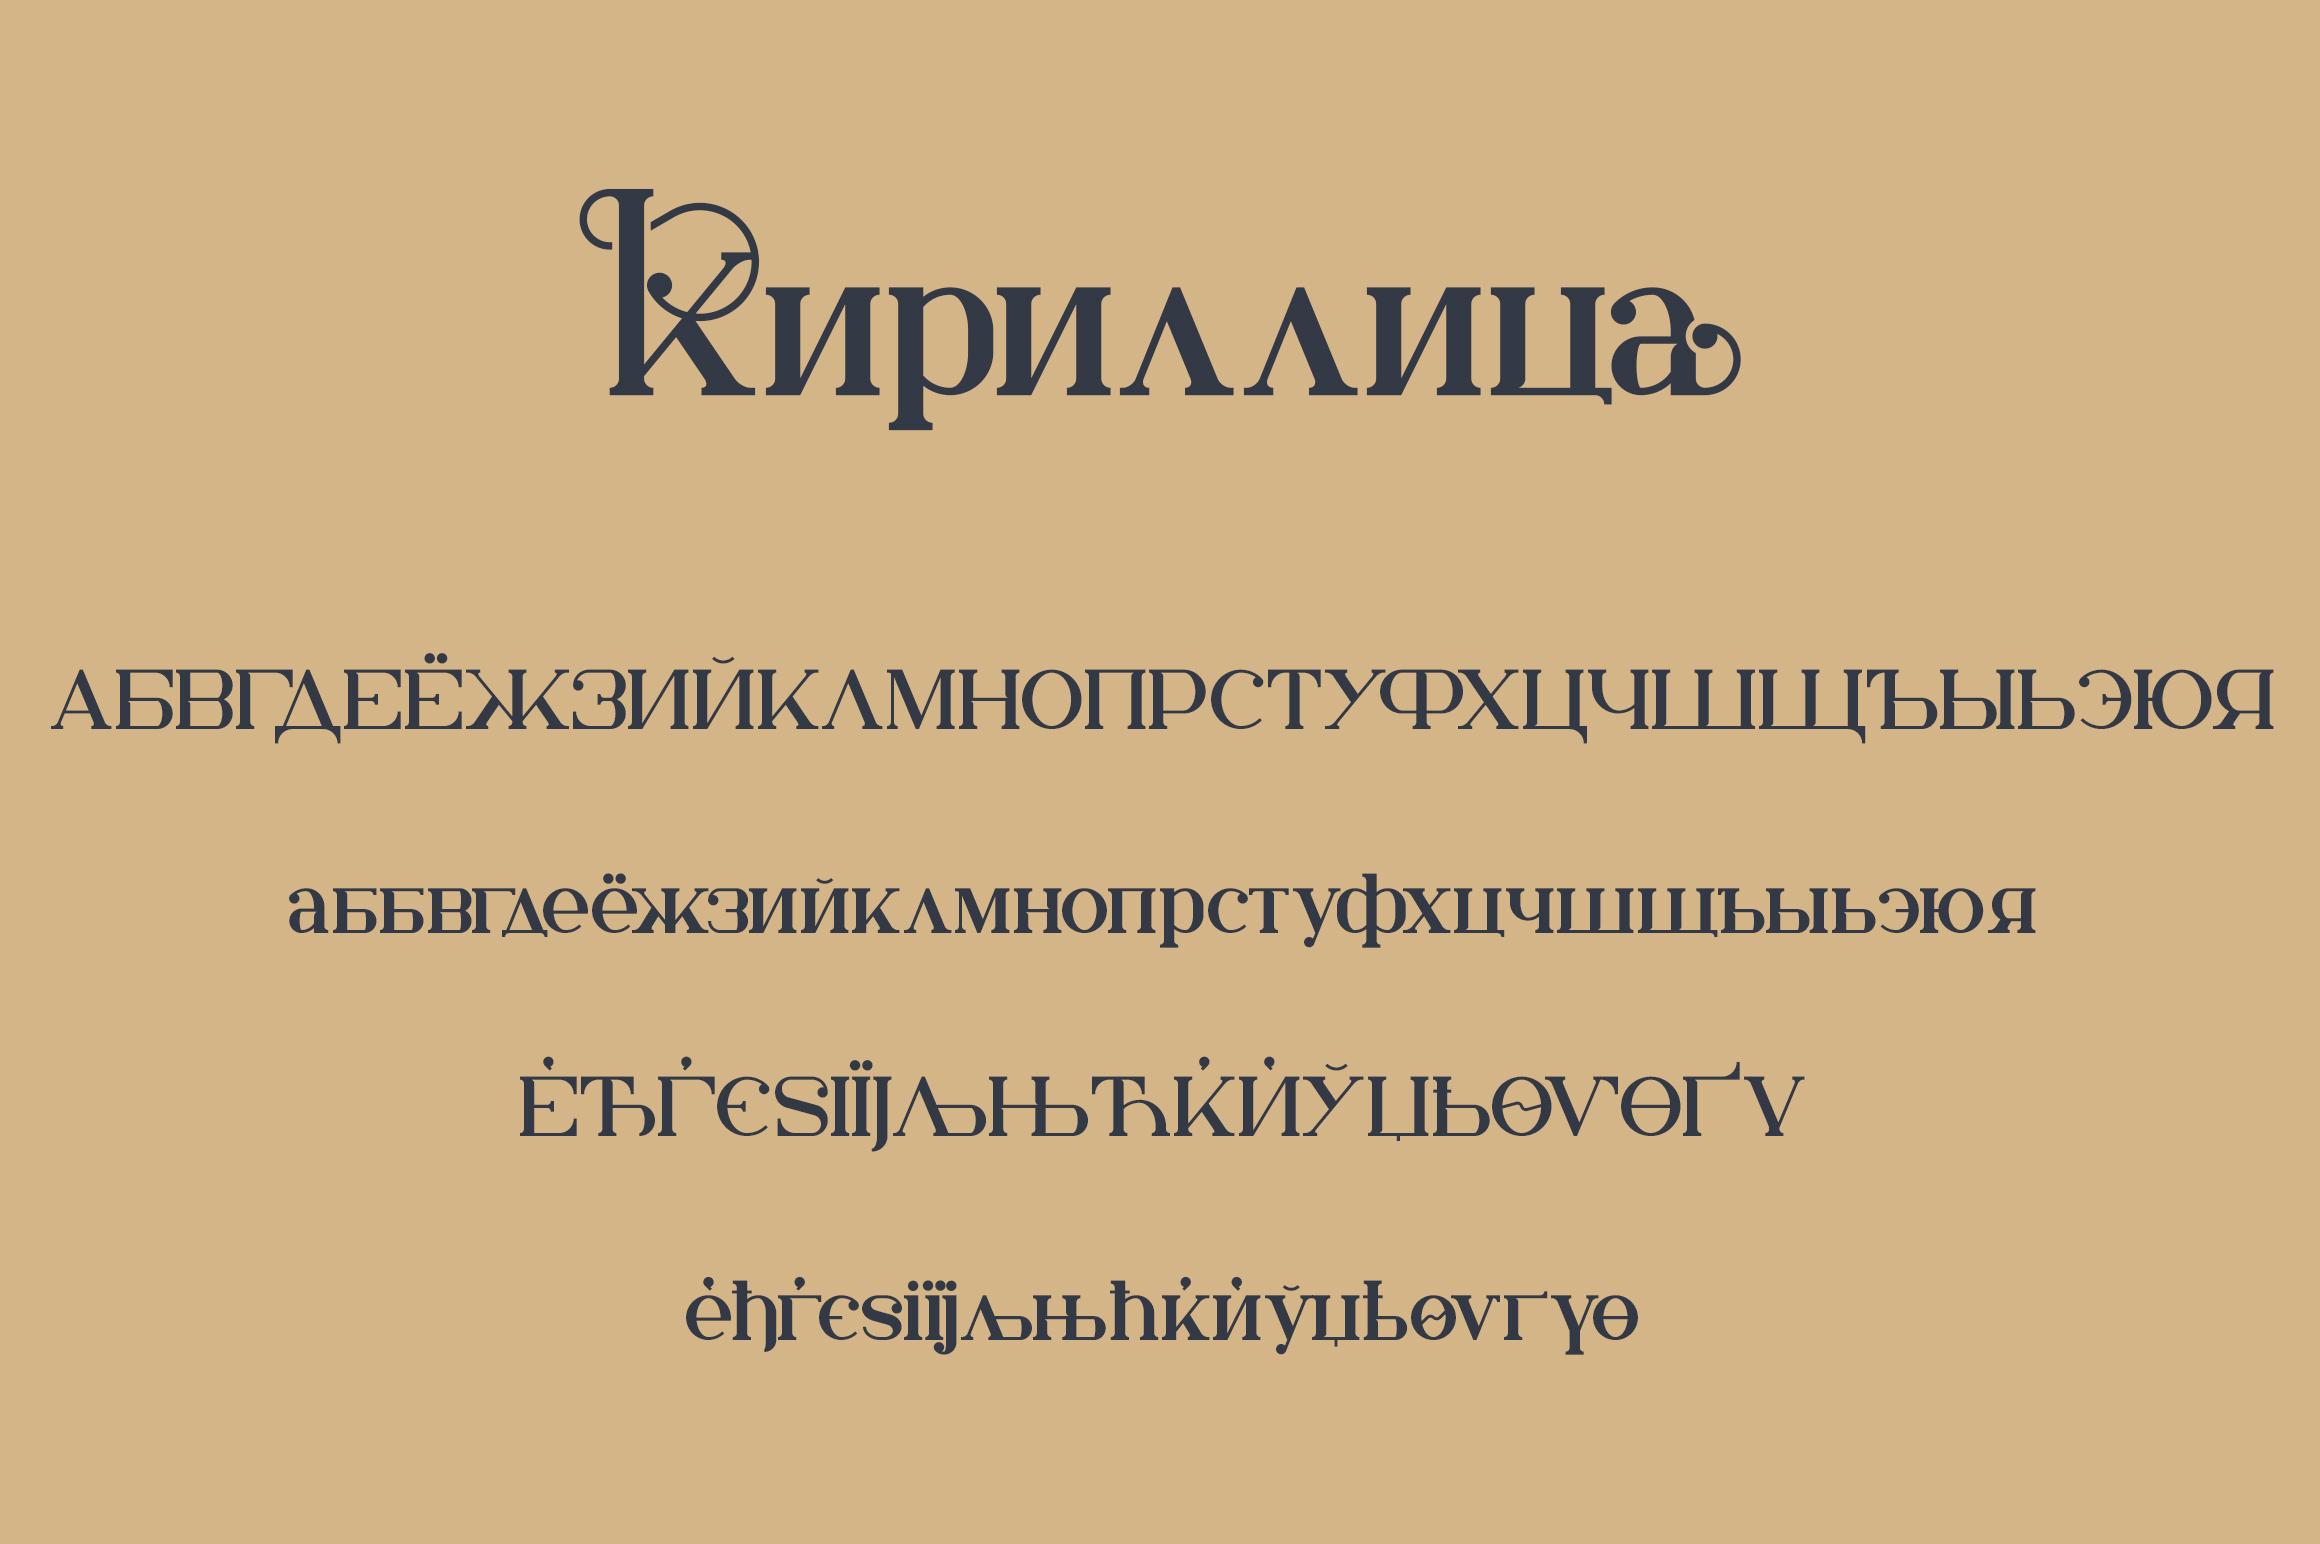 Kuchek Handcrafted Serif Font -3